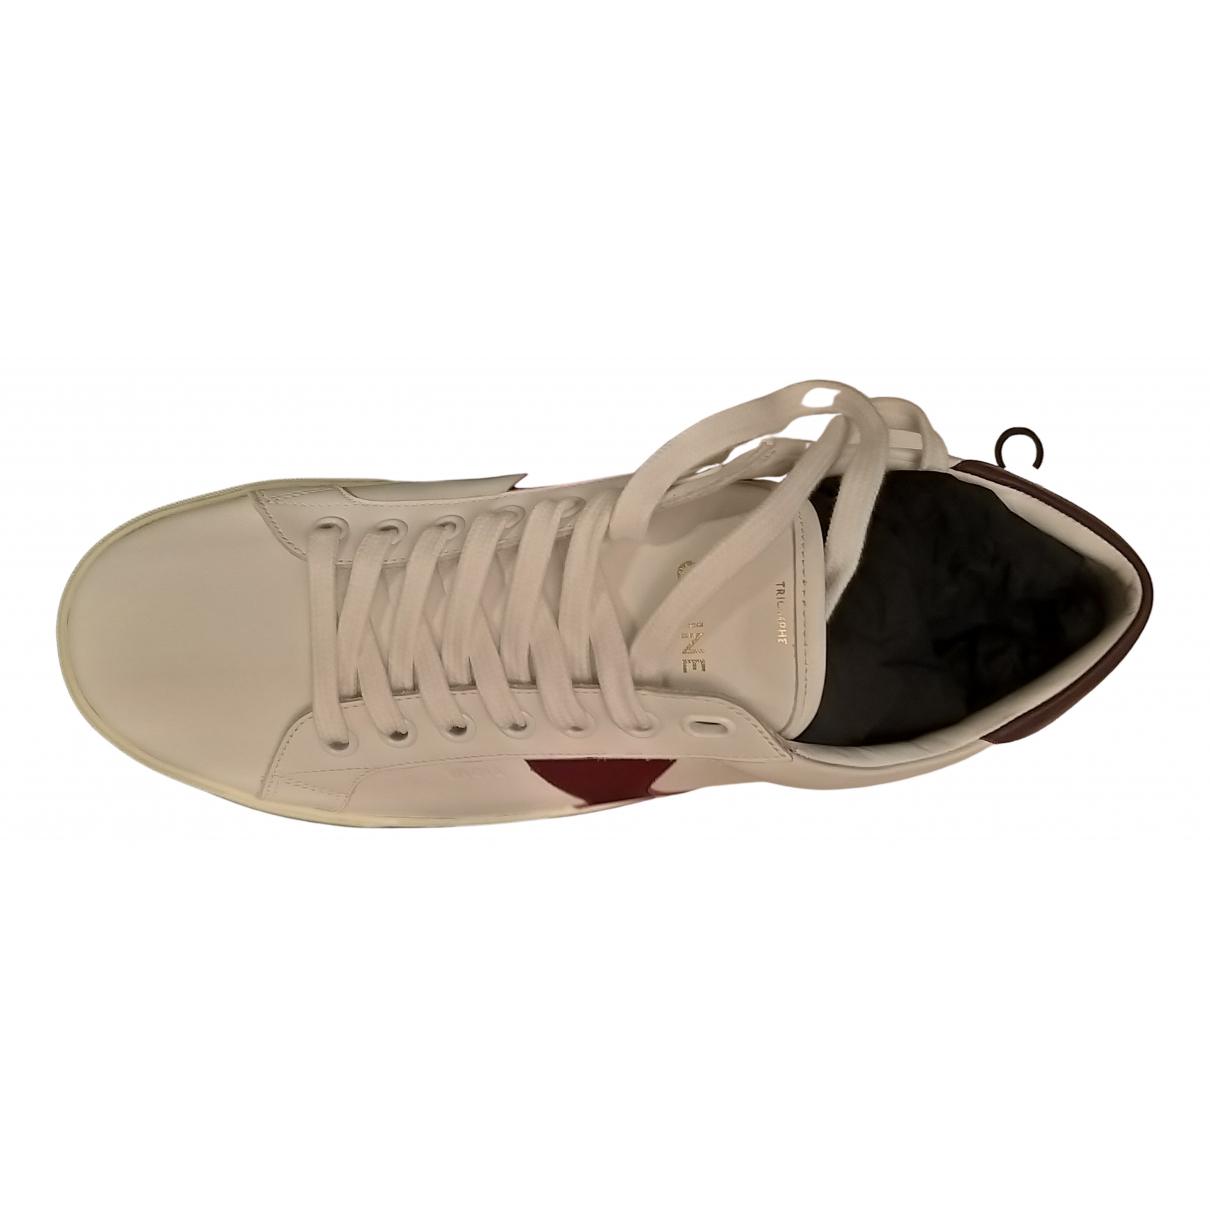 Celine Triomphe Sneakers in  Weiss Leder